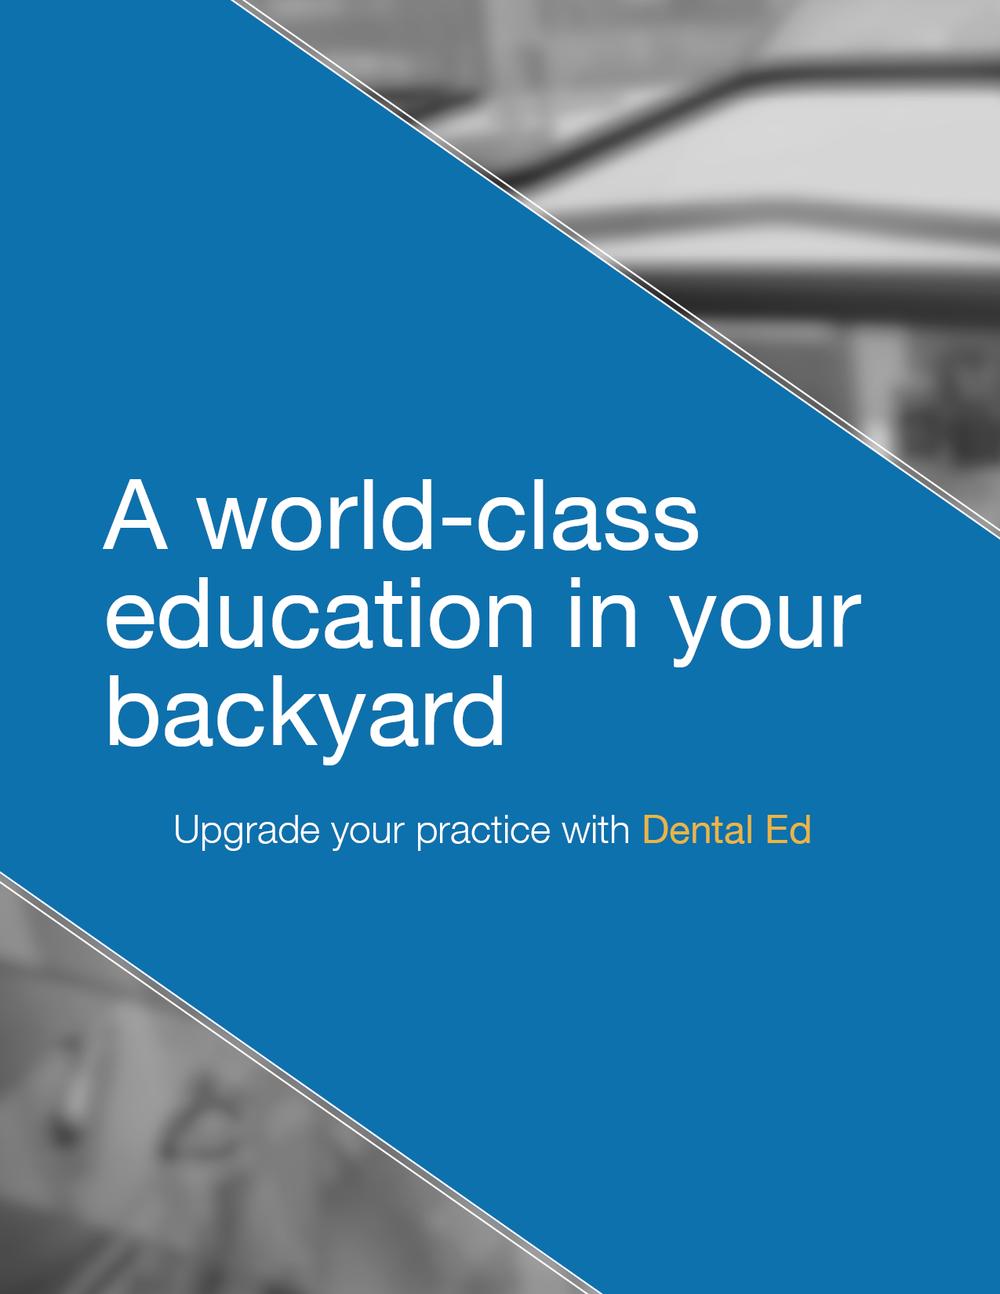 Dental Ed Brochure 2014_1_15.png